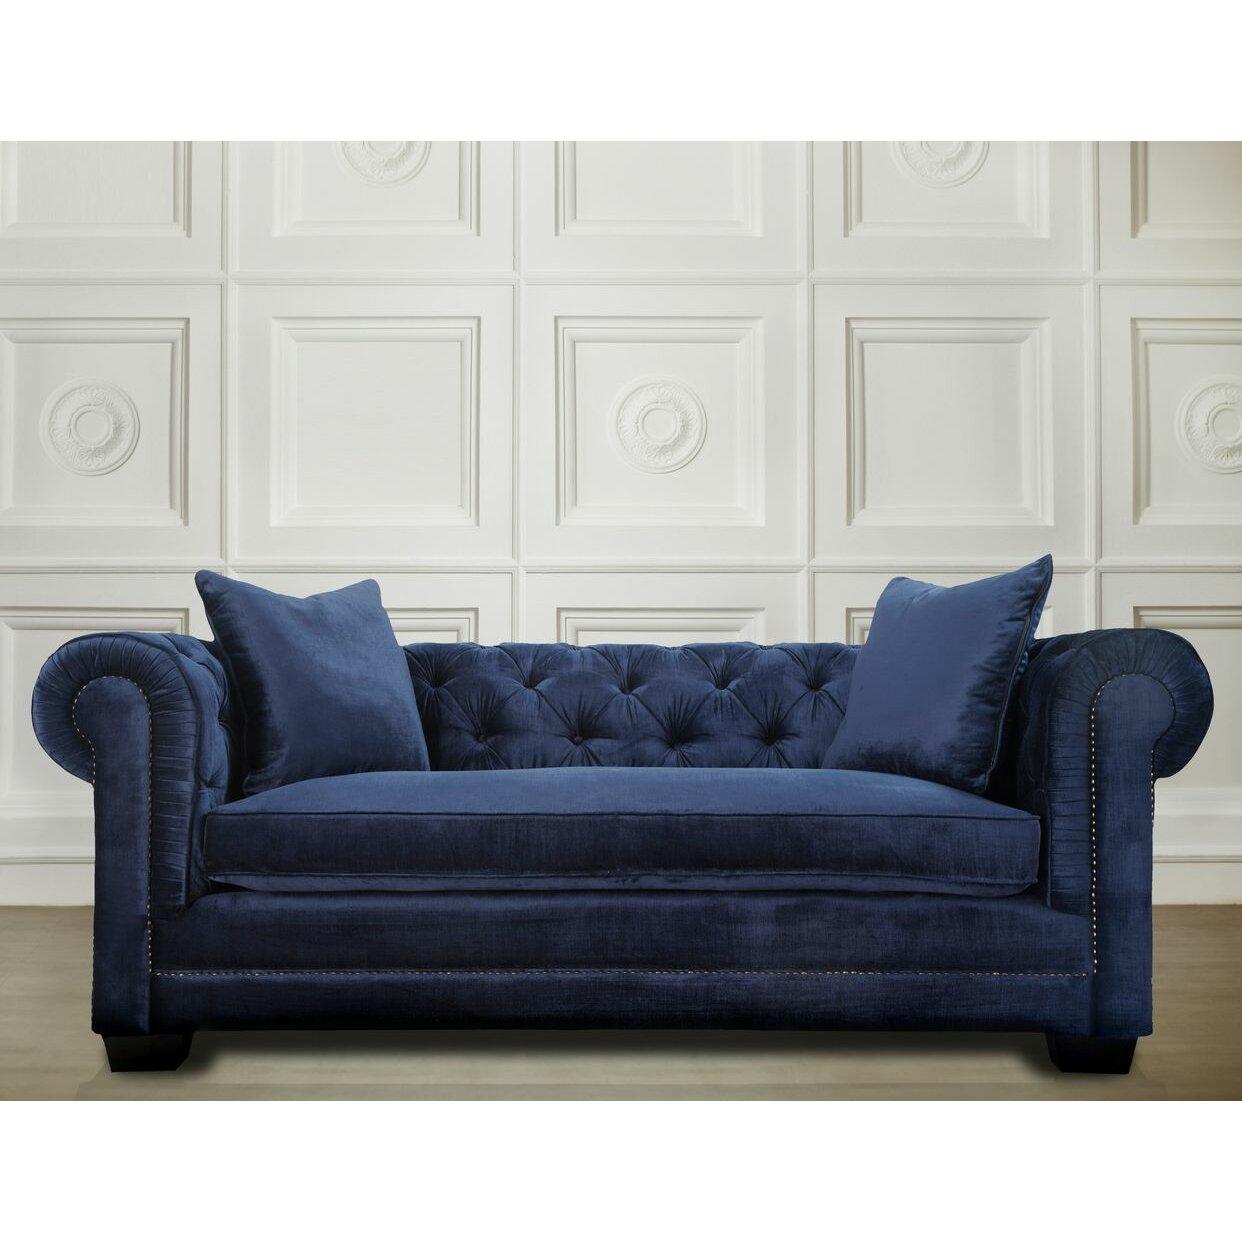 Tov norwalk sofa wayfair for Norwalk furniture sectional sofa